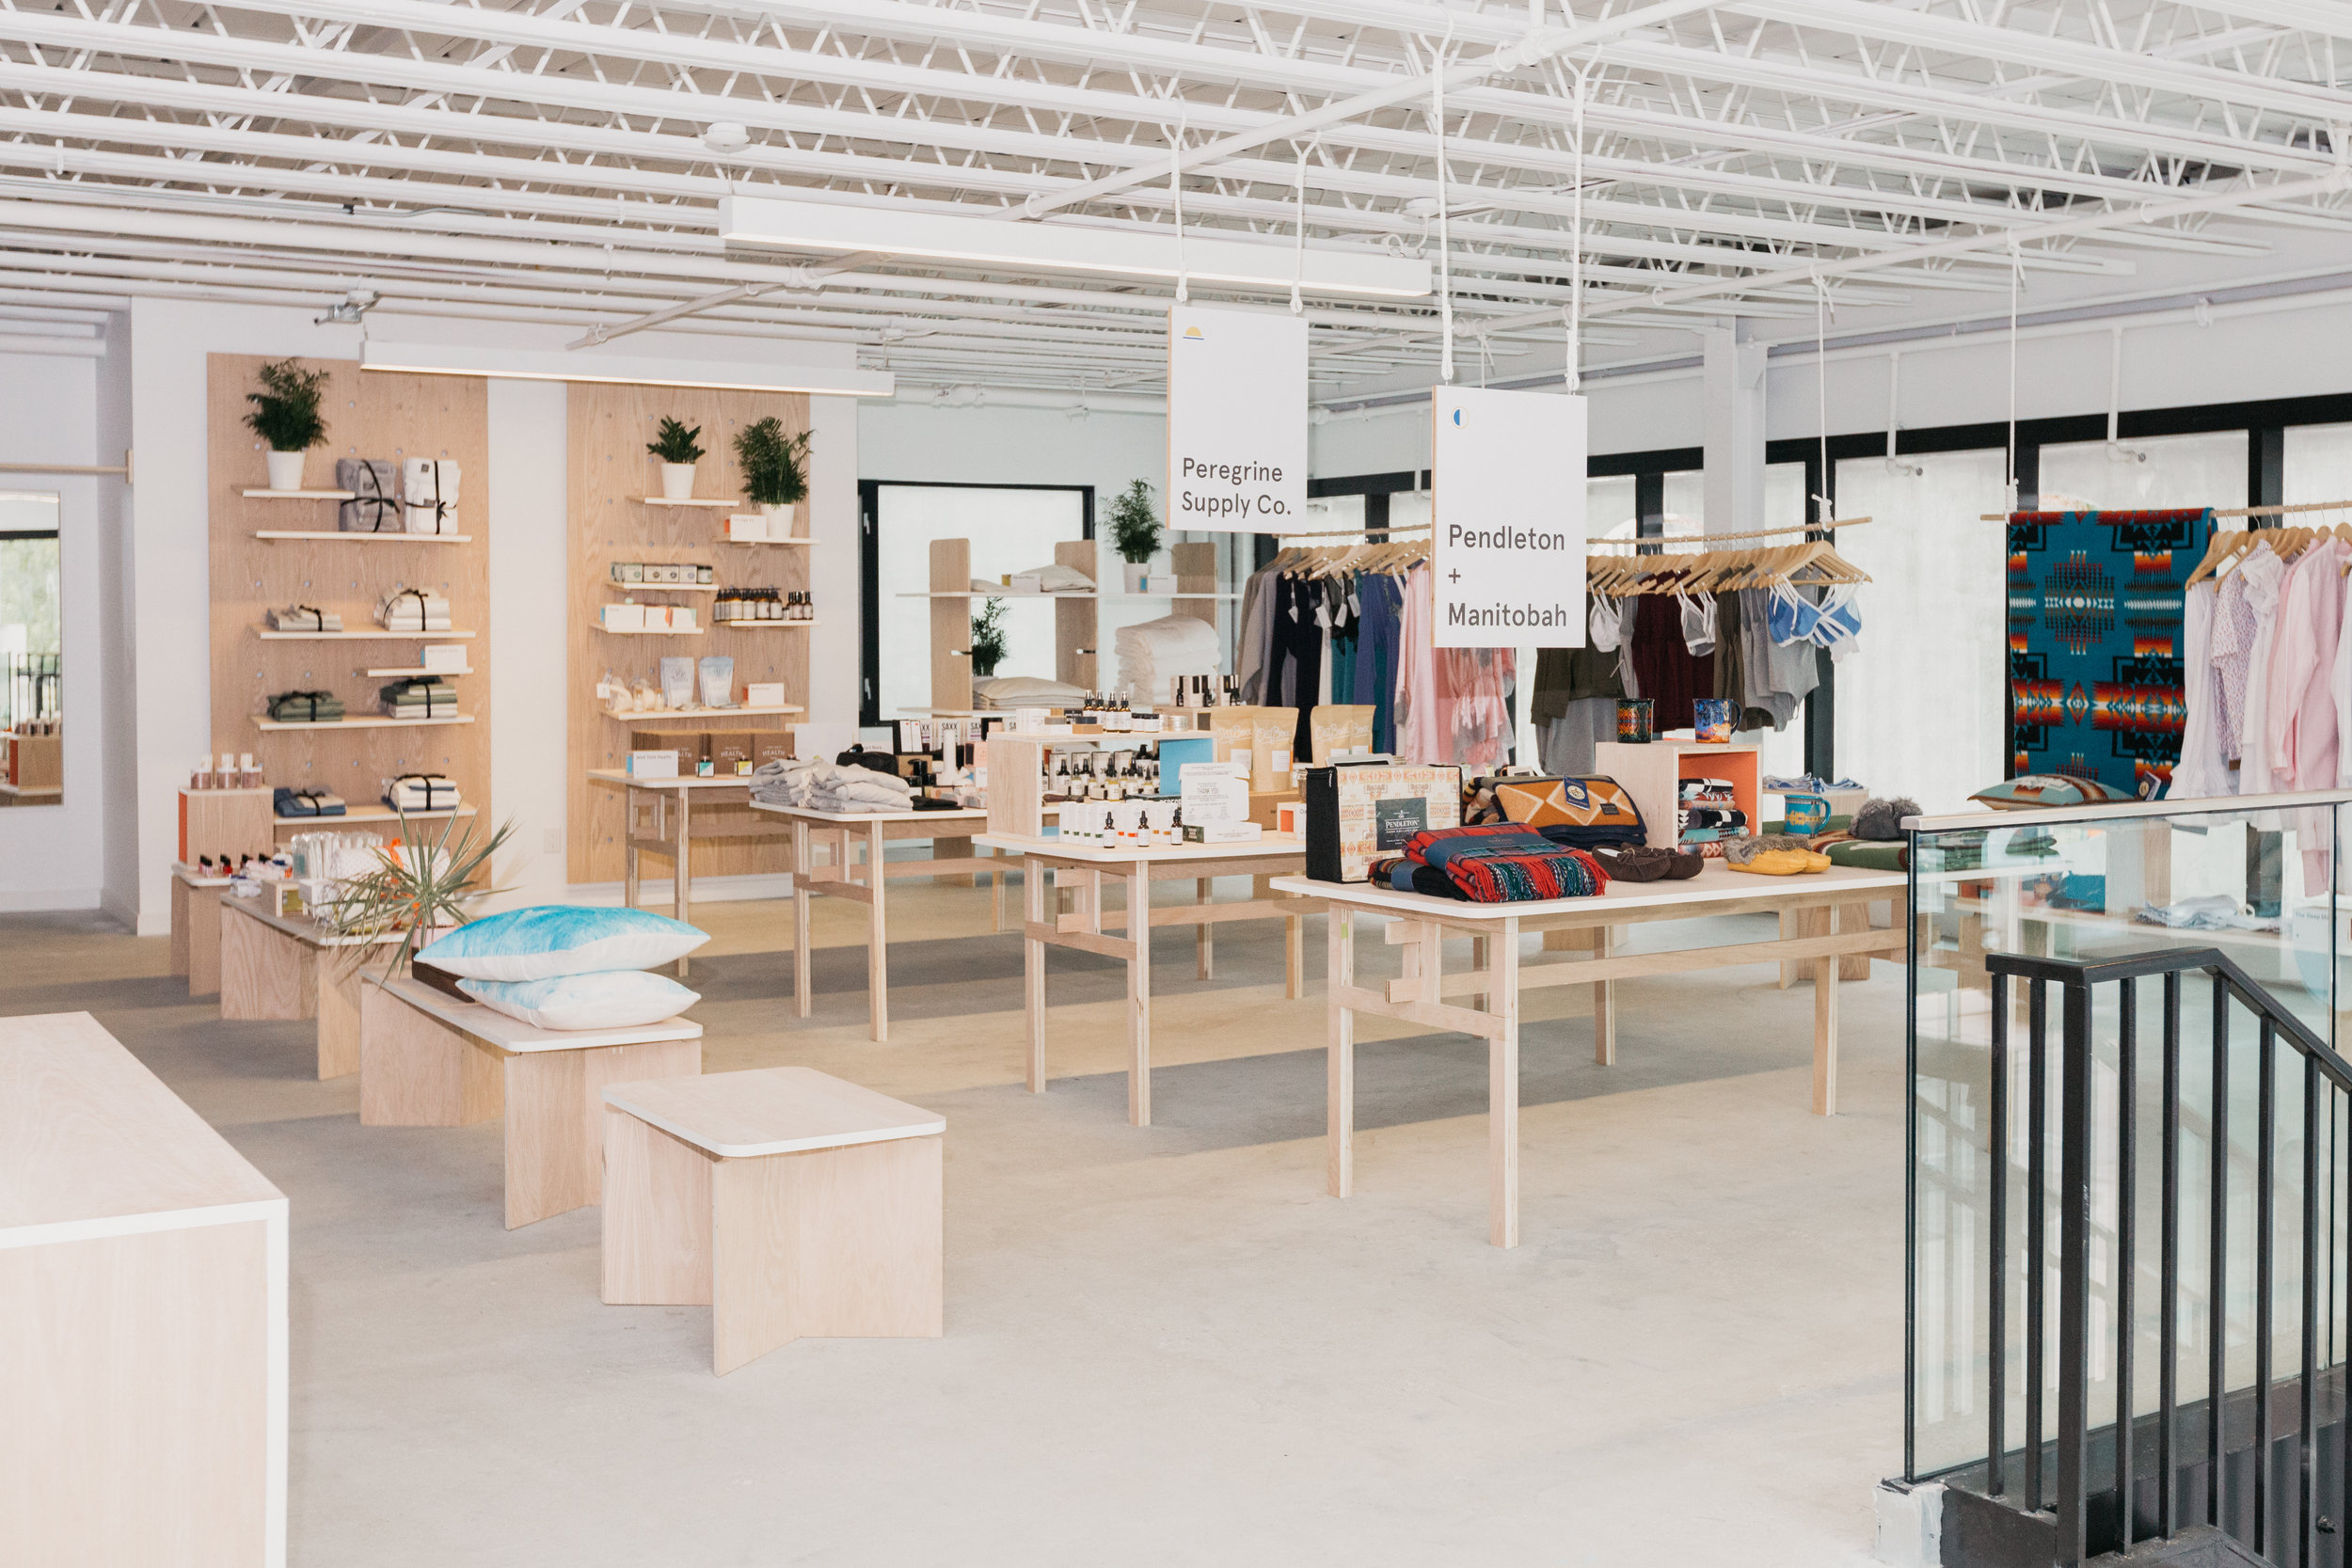 thisopenspace : Retail Store Design